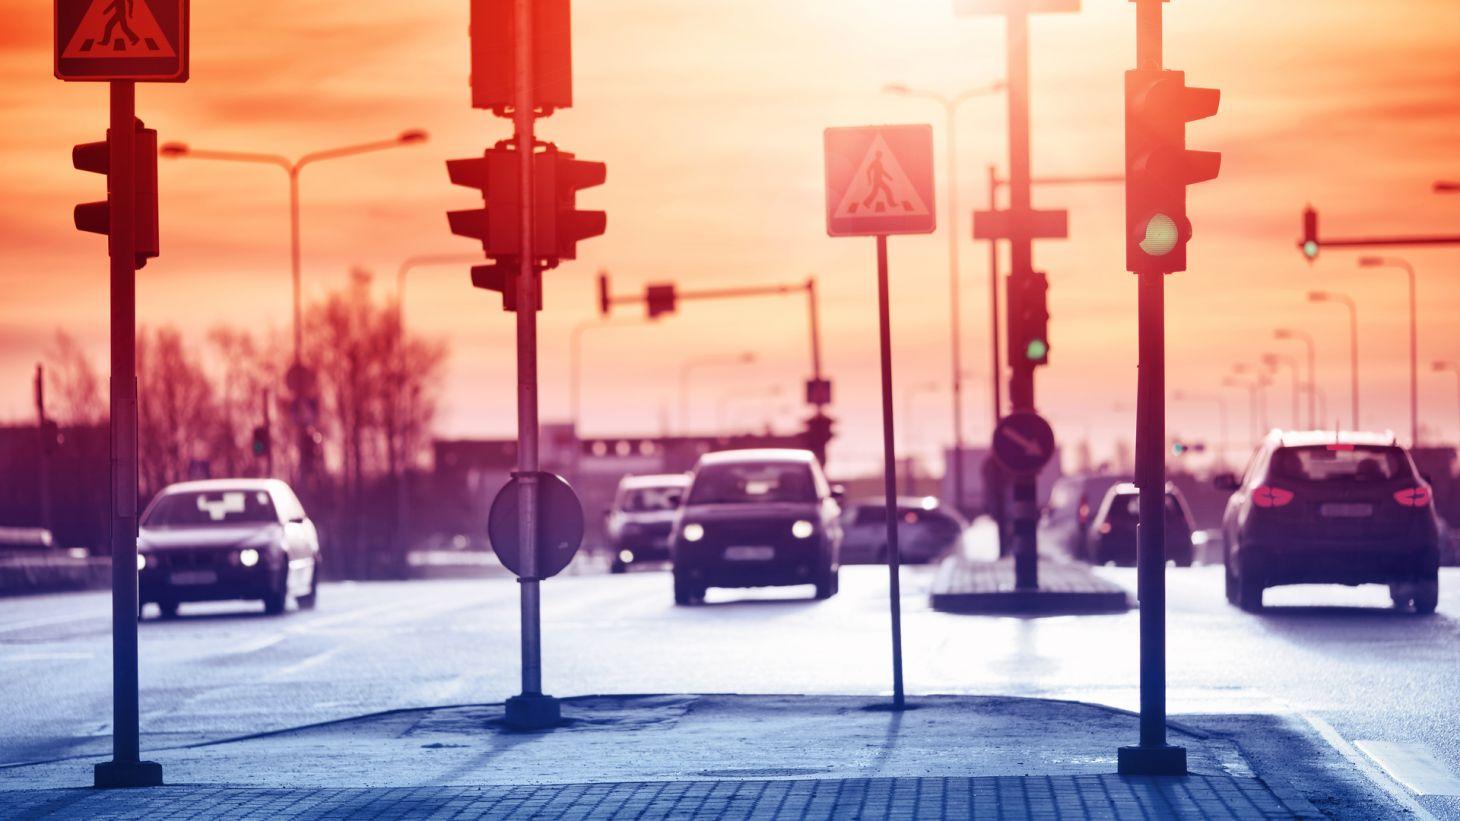 rua via avenida trafego transito carros automoveis semaforos sinais calcada